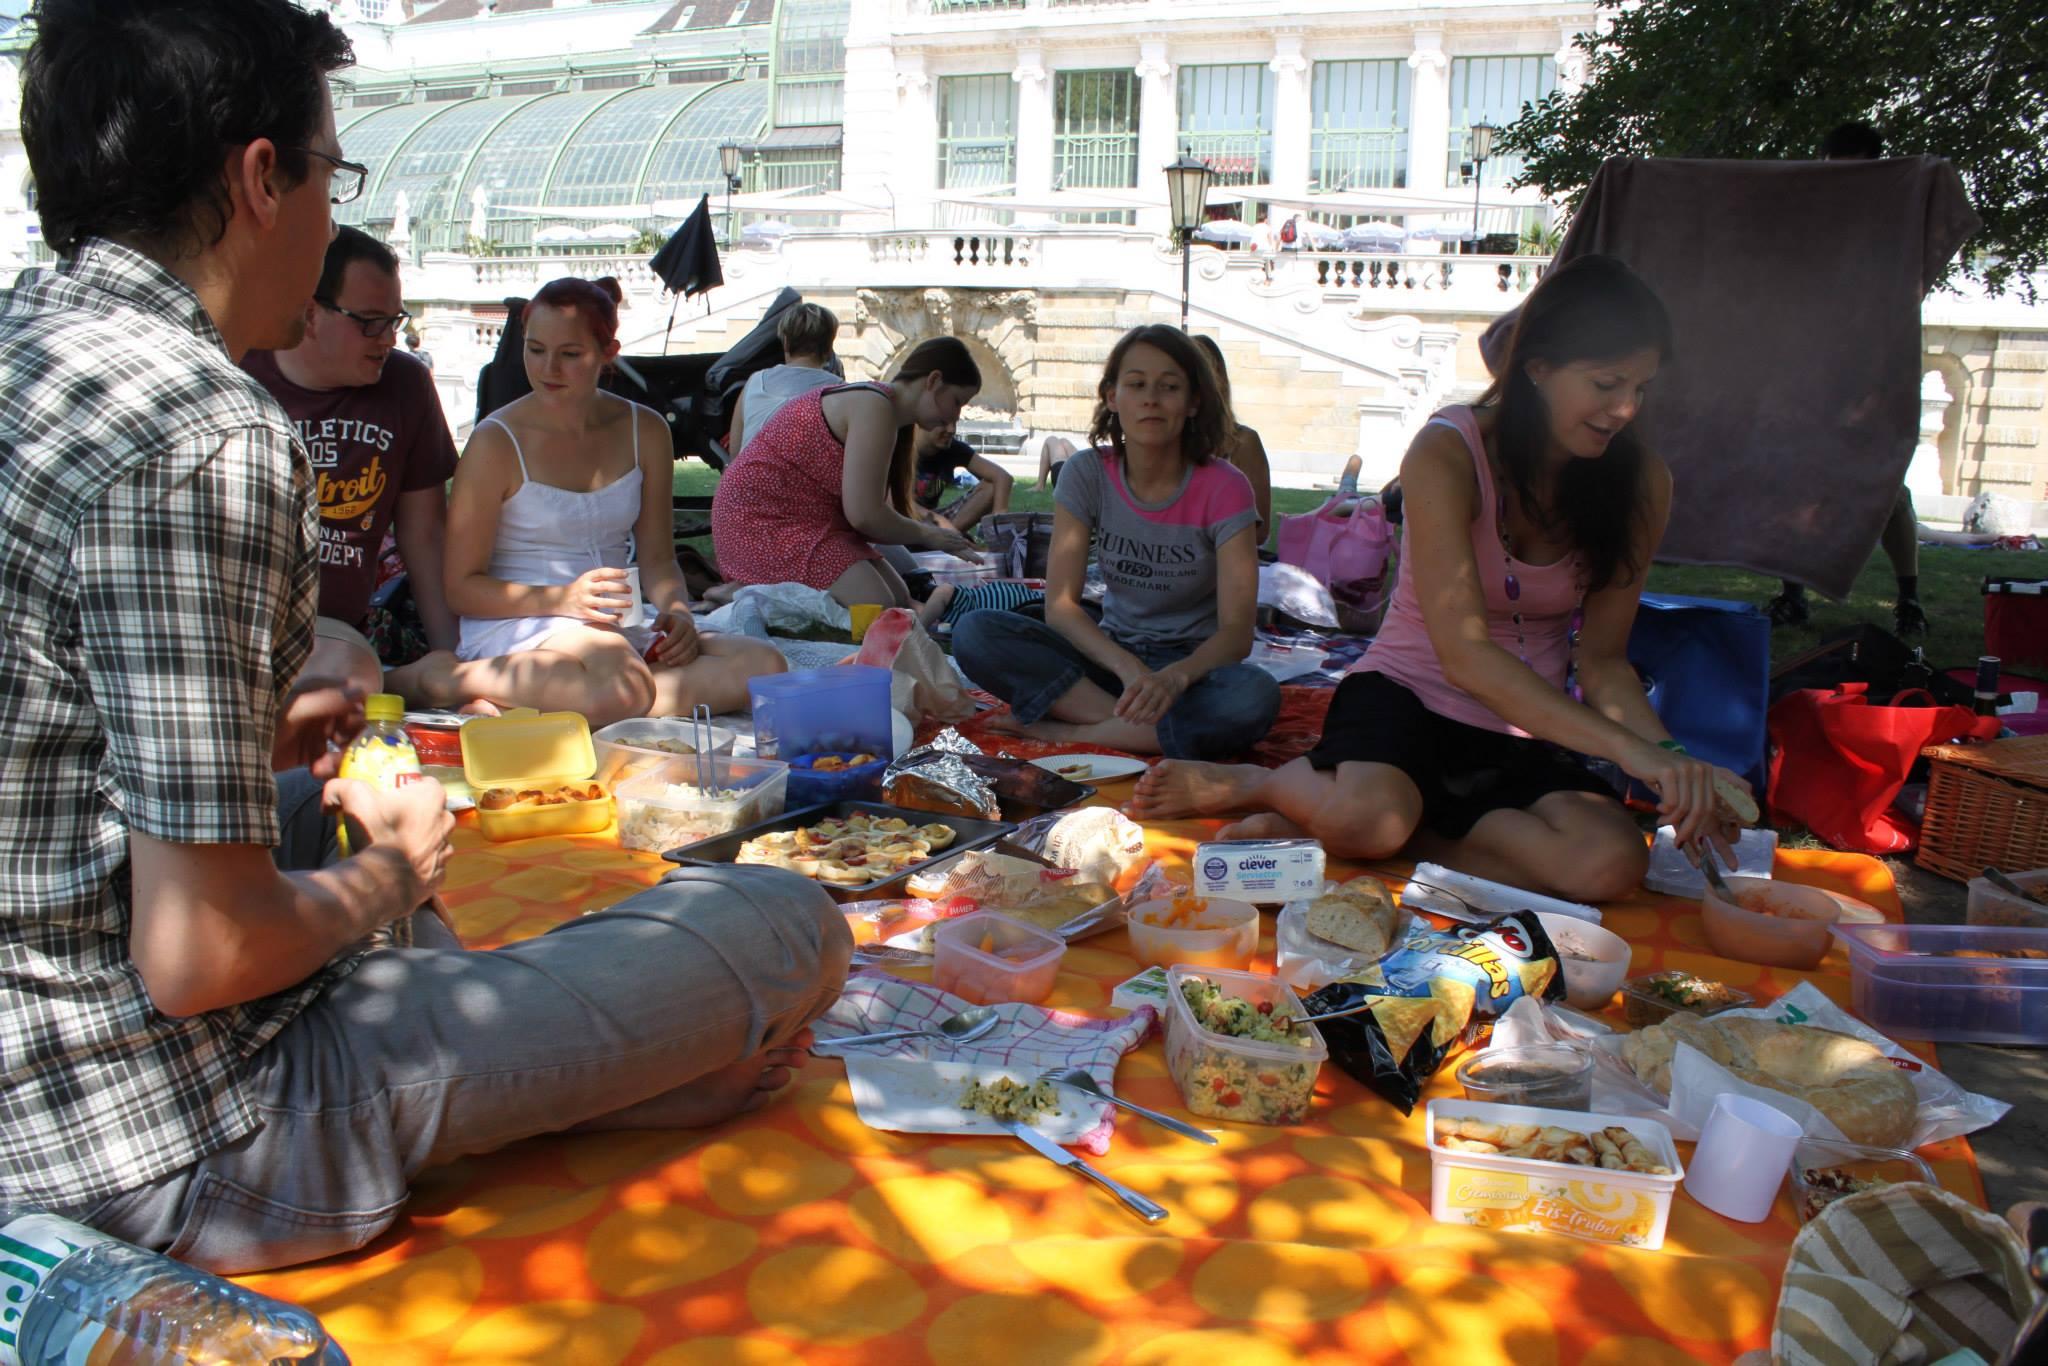 Foodblogger Picknick 2.0